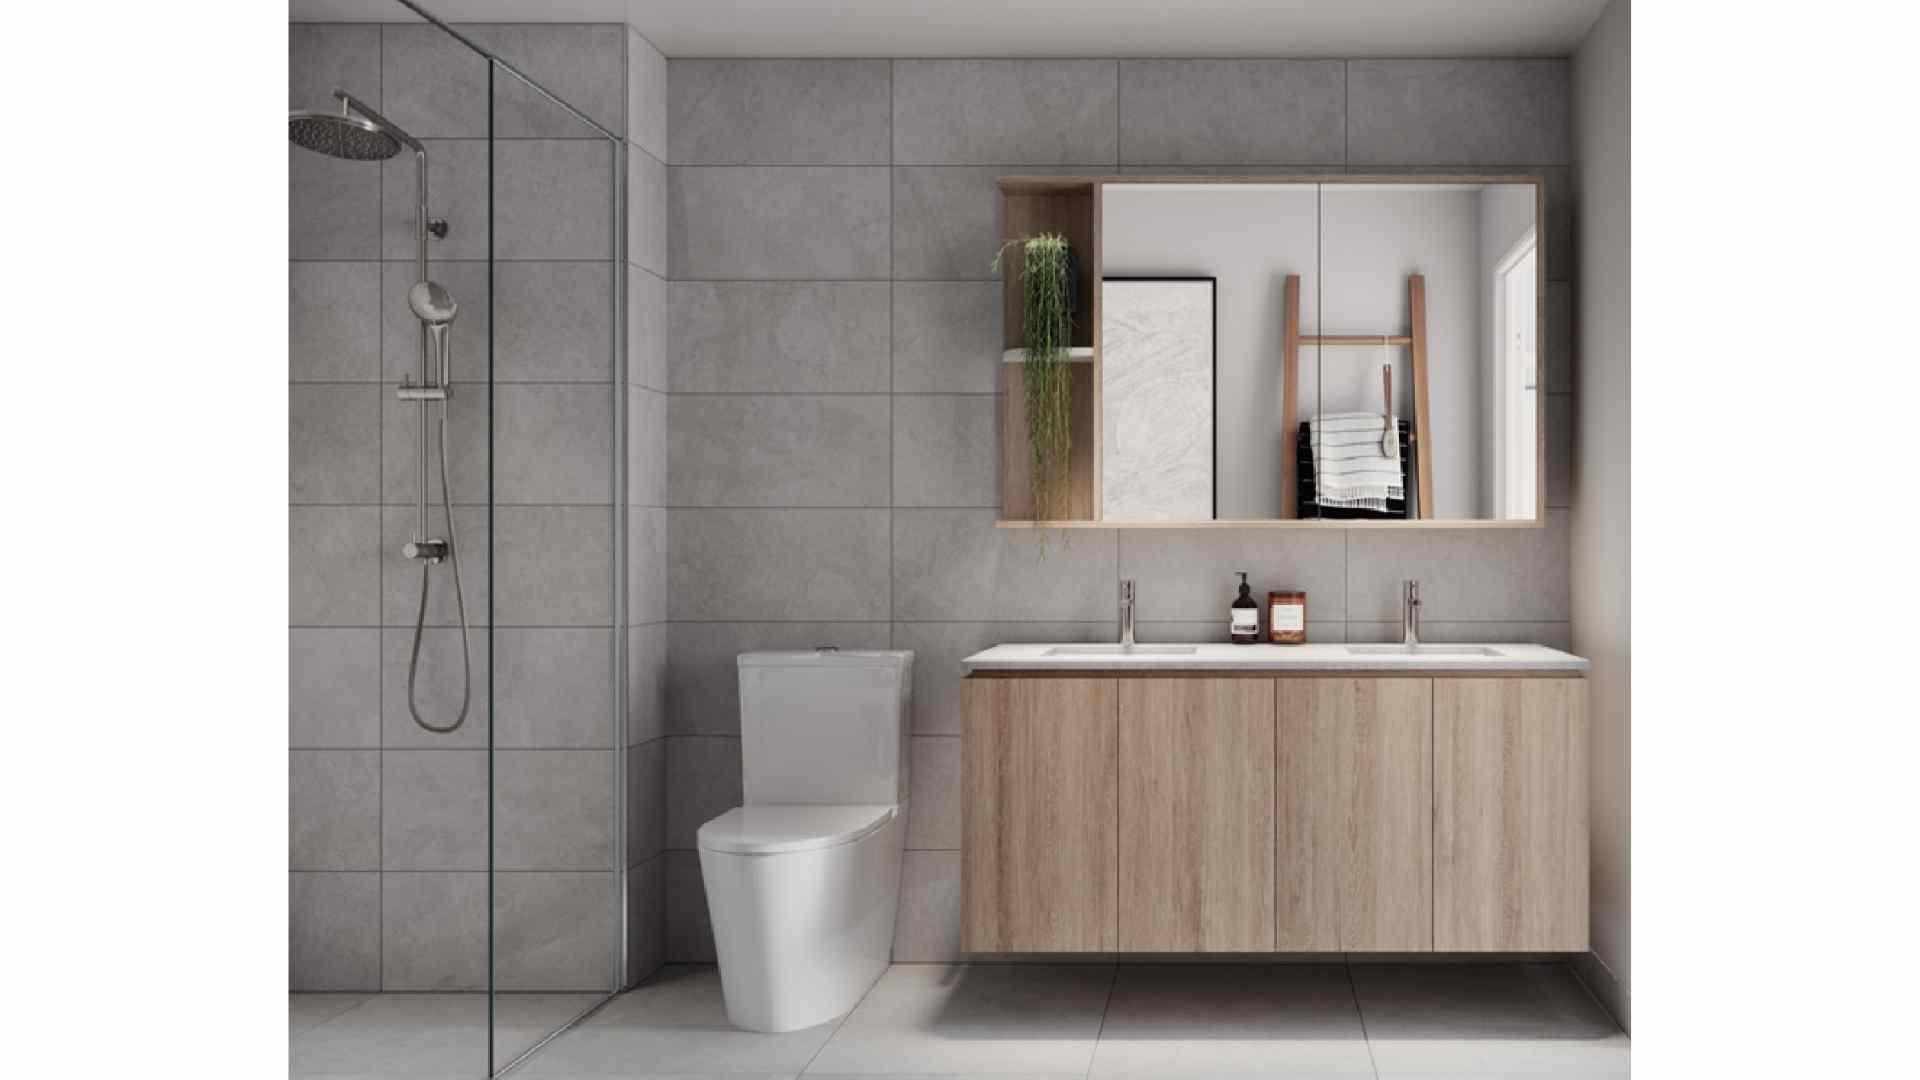 grey bathroom with wooden cabinet